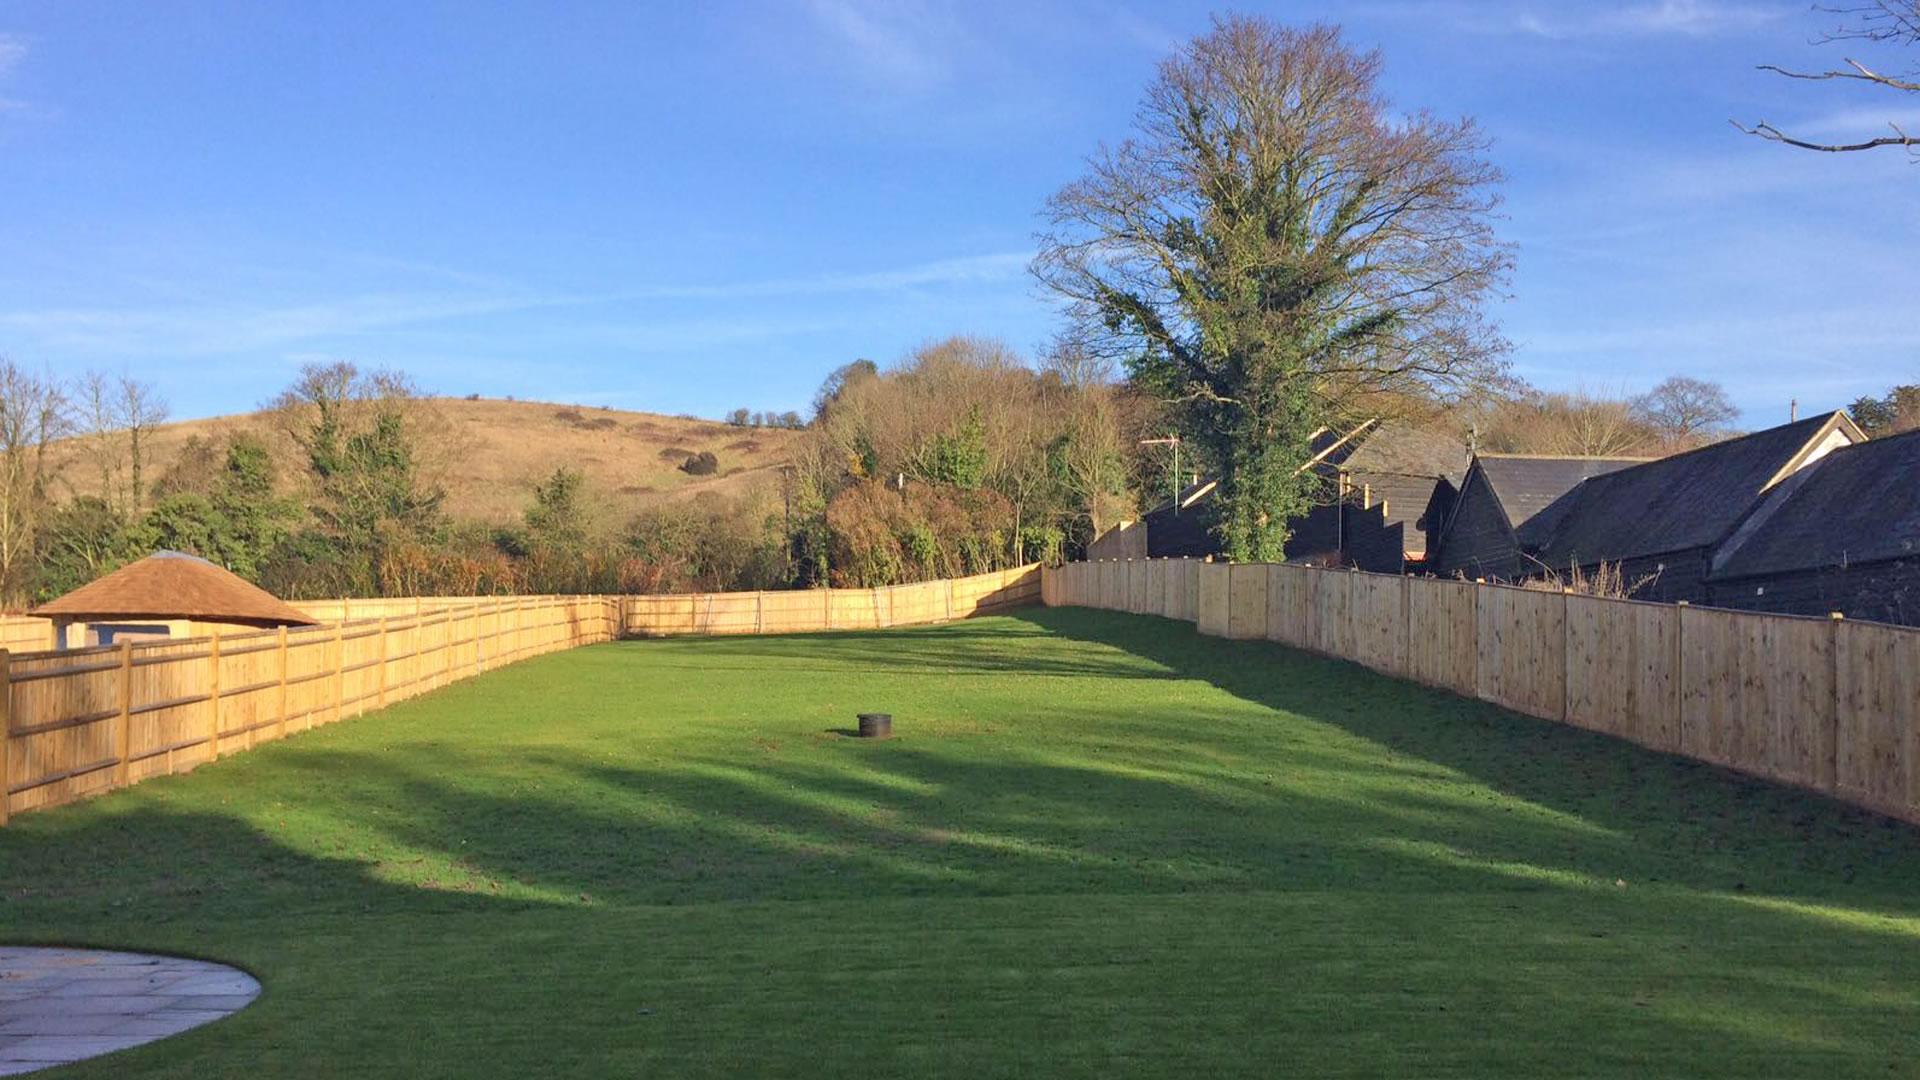 Burwood House, Pilgrims Place garden